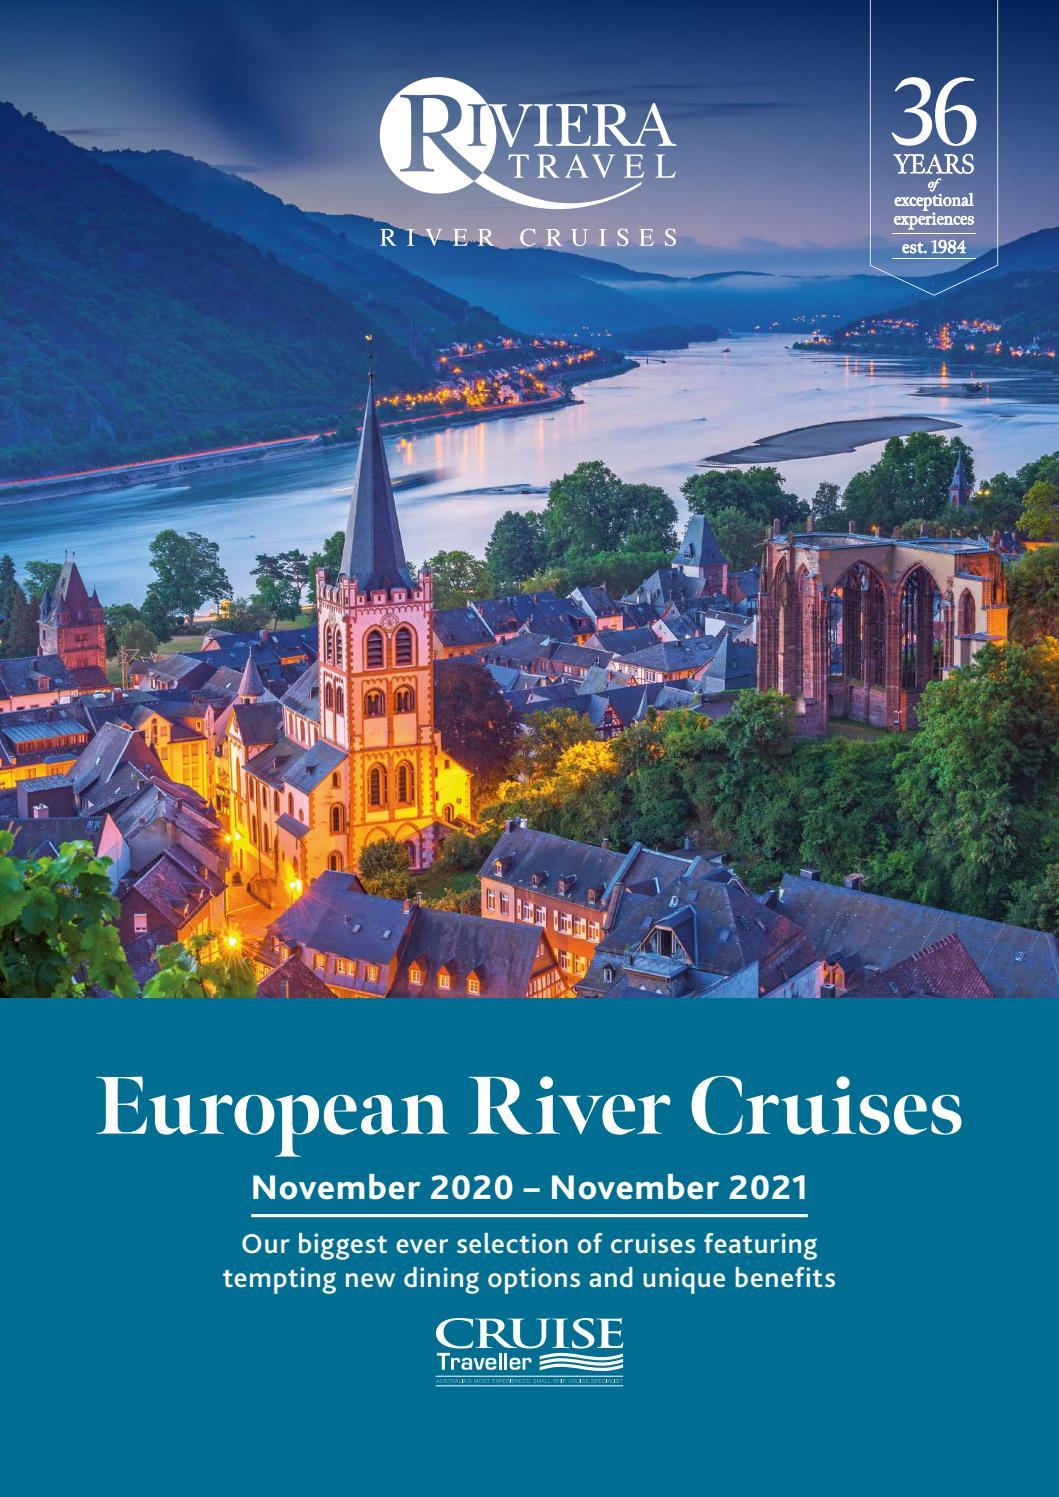 European River Cruises November 2020 To November 2021 Cruise Pertaining To El Monte Union First Day Of School 2021 18 Calendar